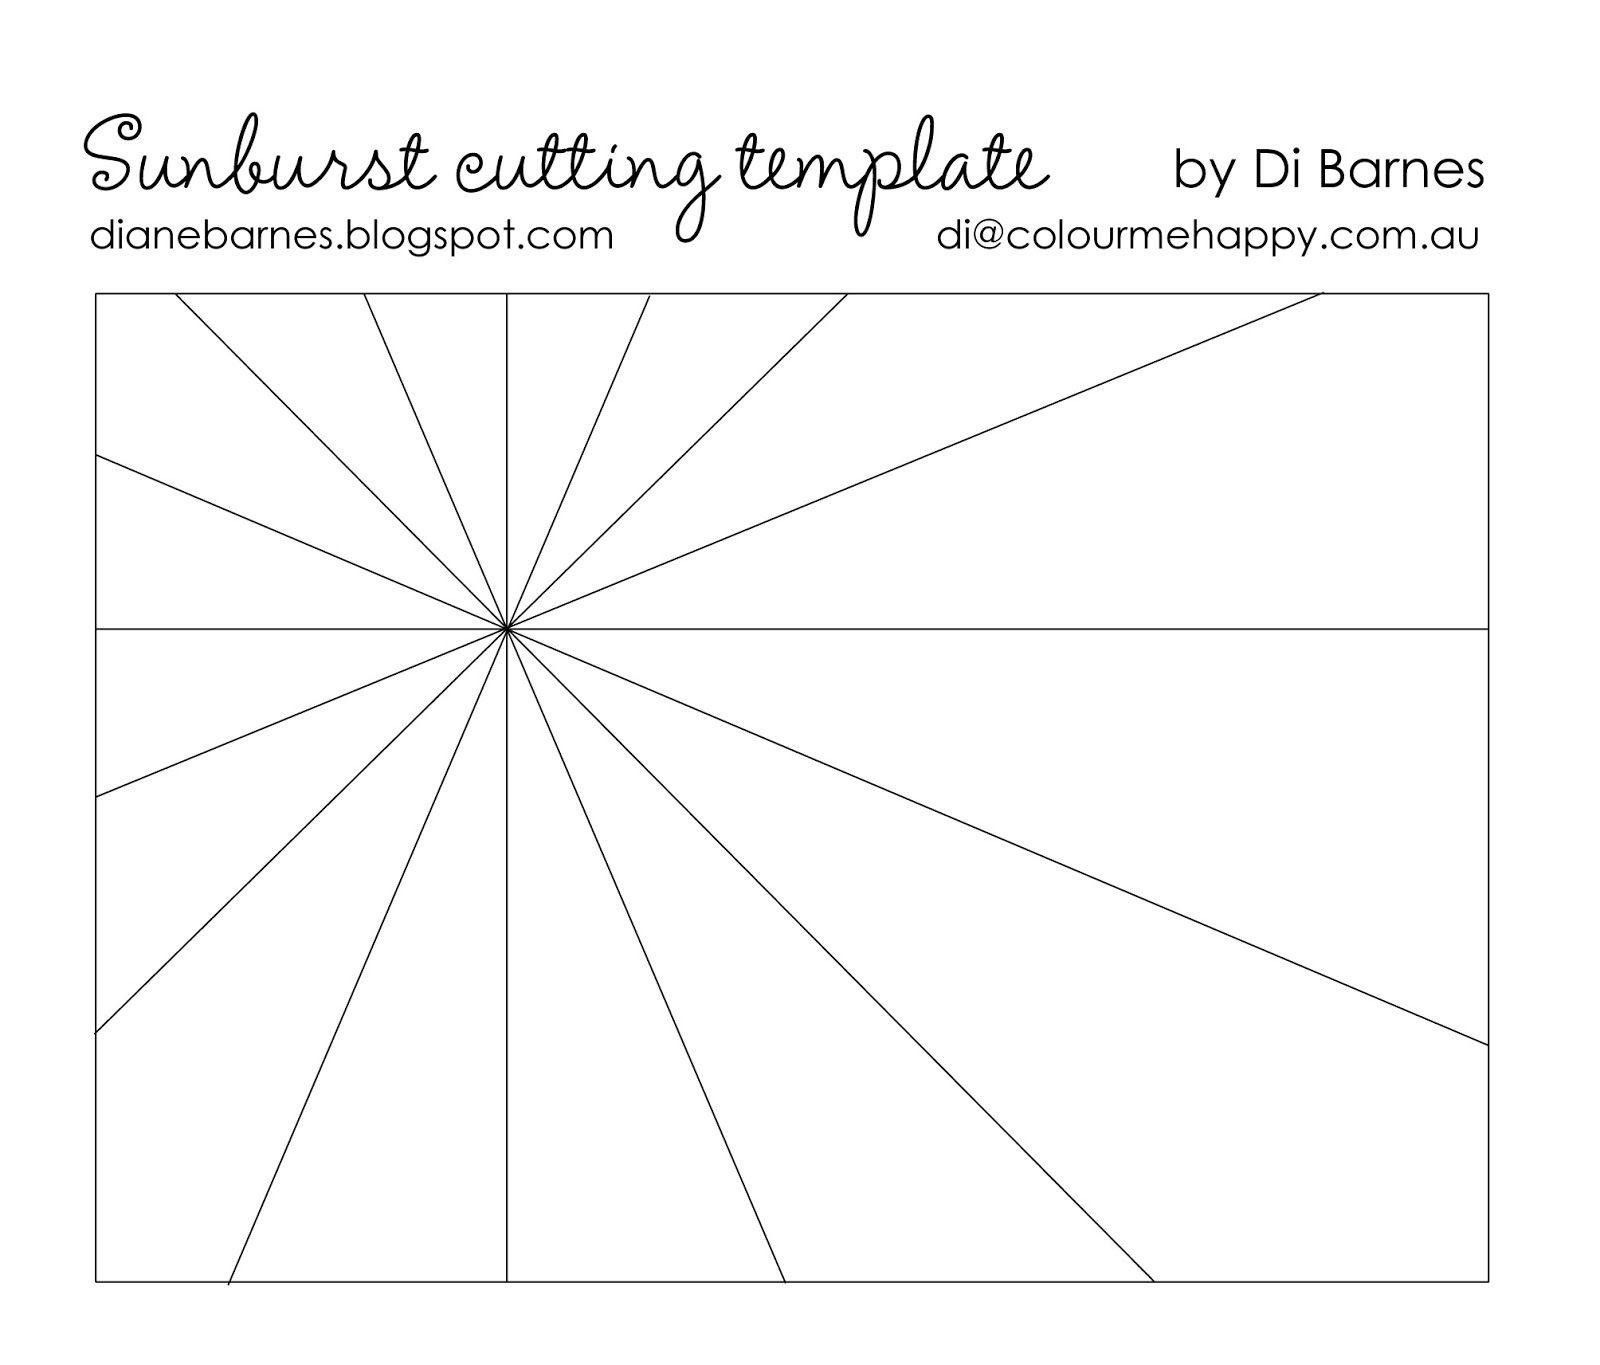 JAI 267 Just add typography - & sunburst template   Card making ...